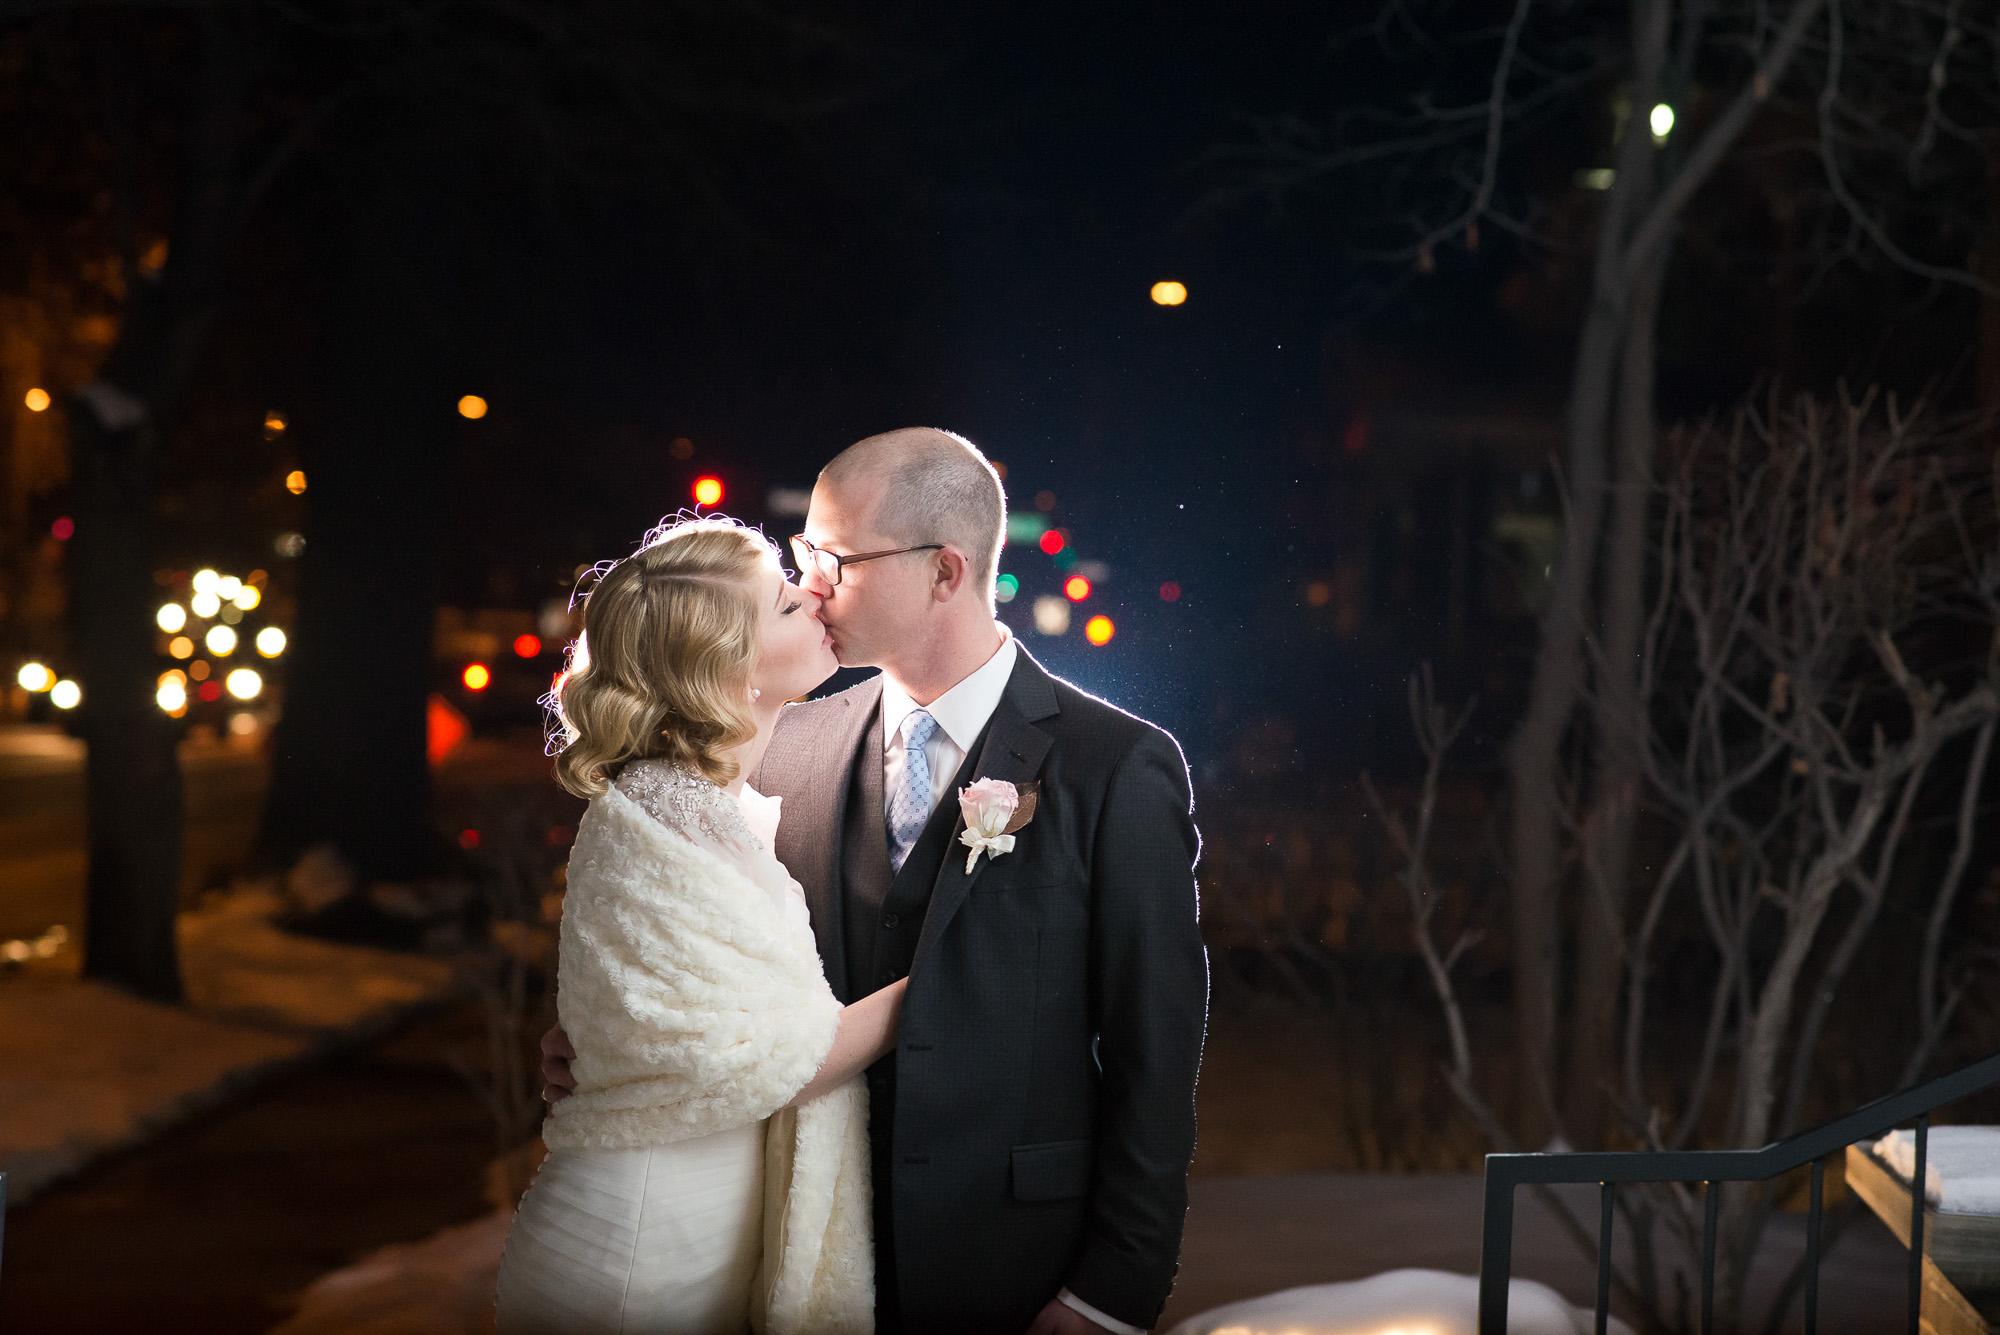 135elopement-photographer-colorado-denver_wedding_photographer_parkside_mansion_wedding_jessie&matt_1287.jpg